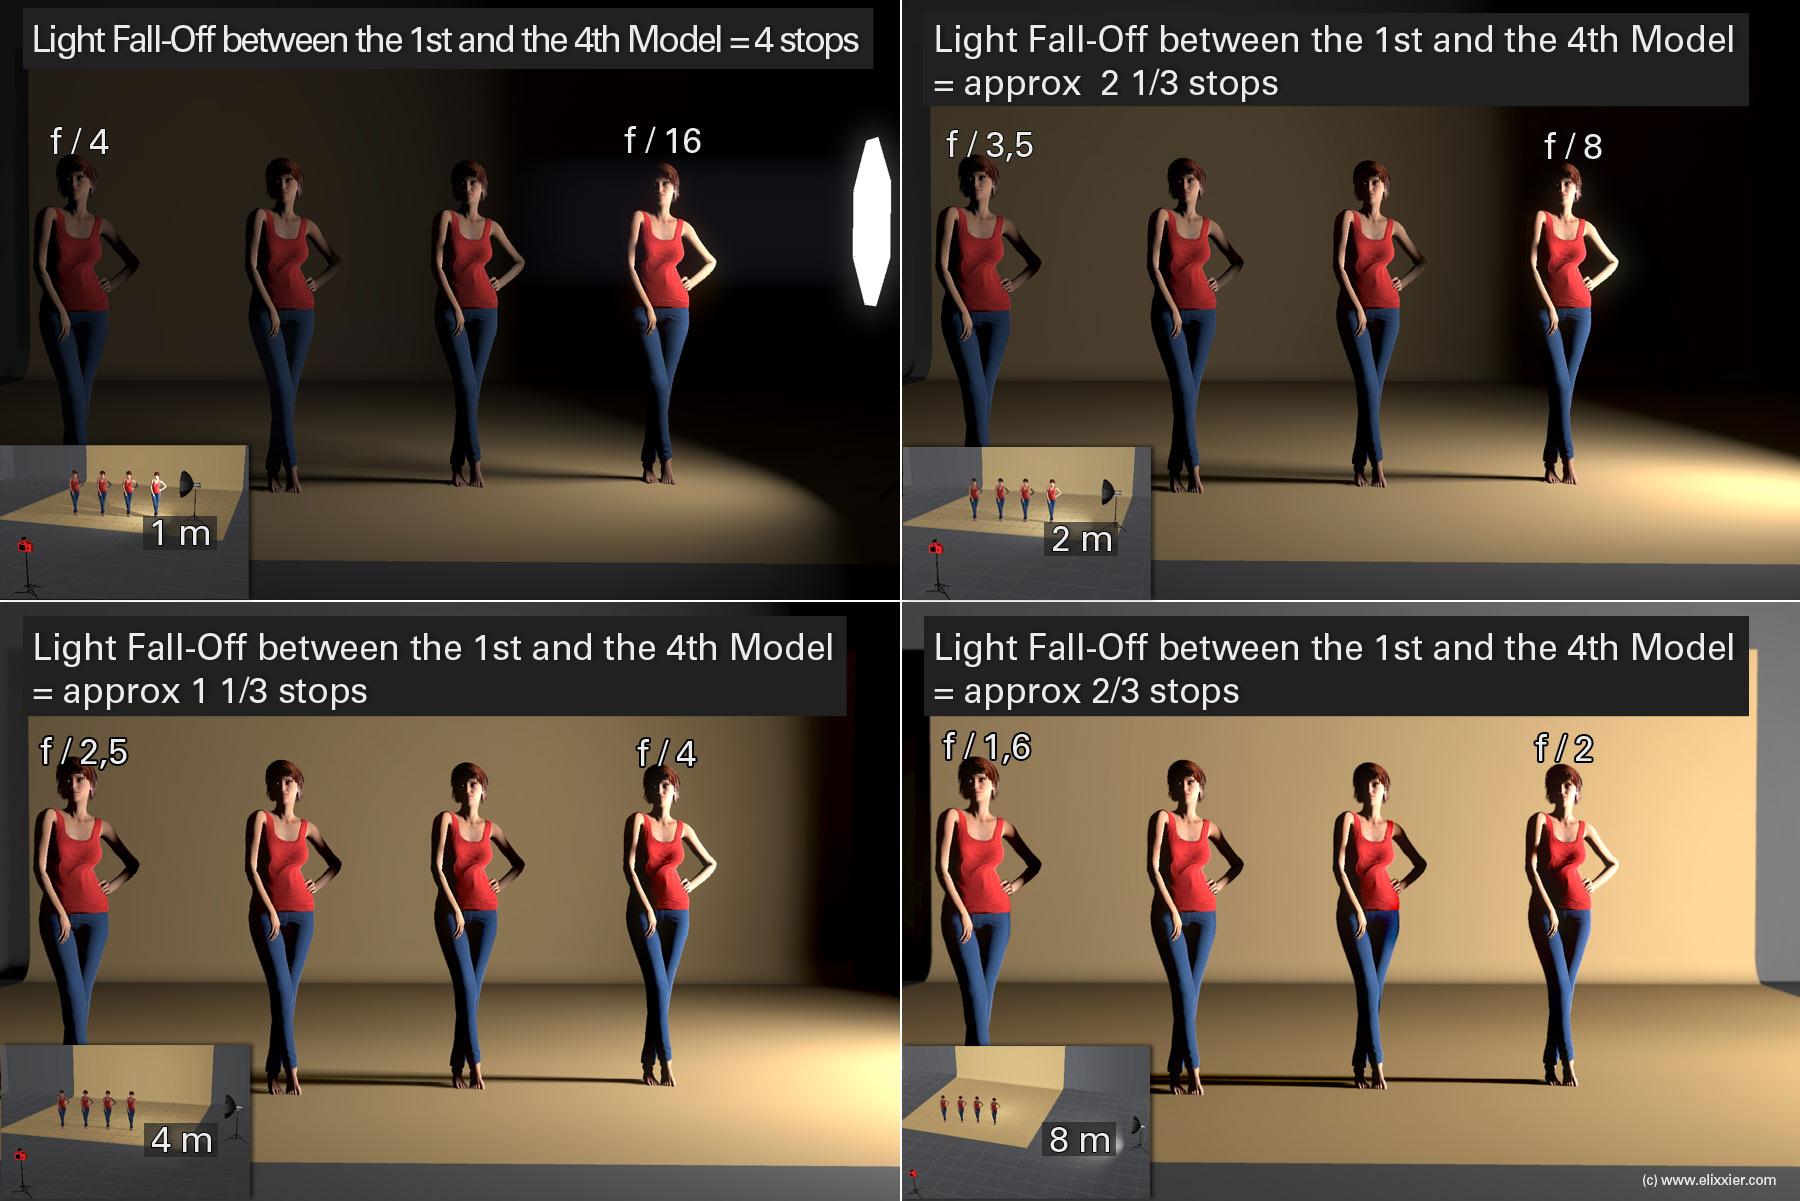 Light-Fall-Off-between-models